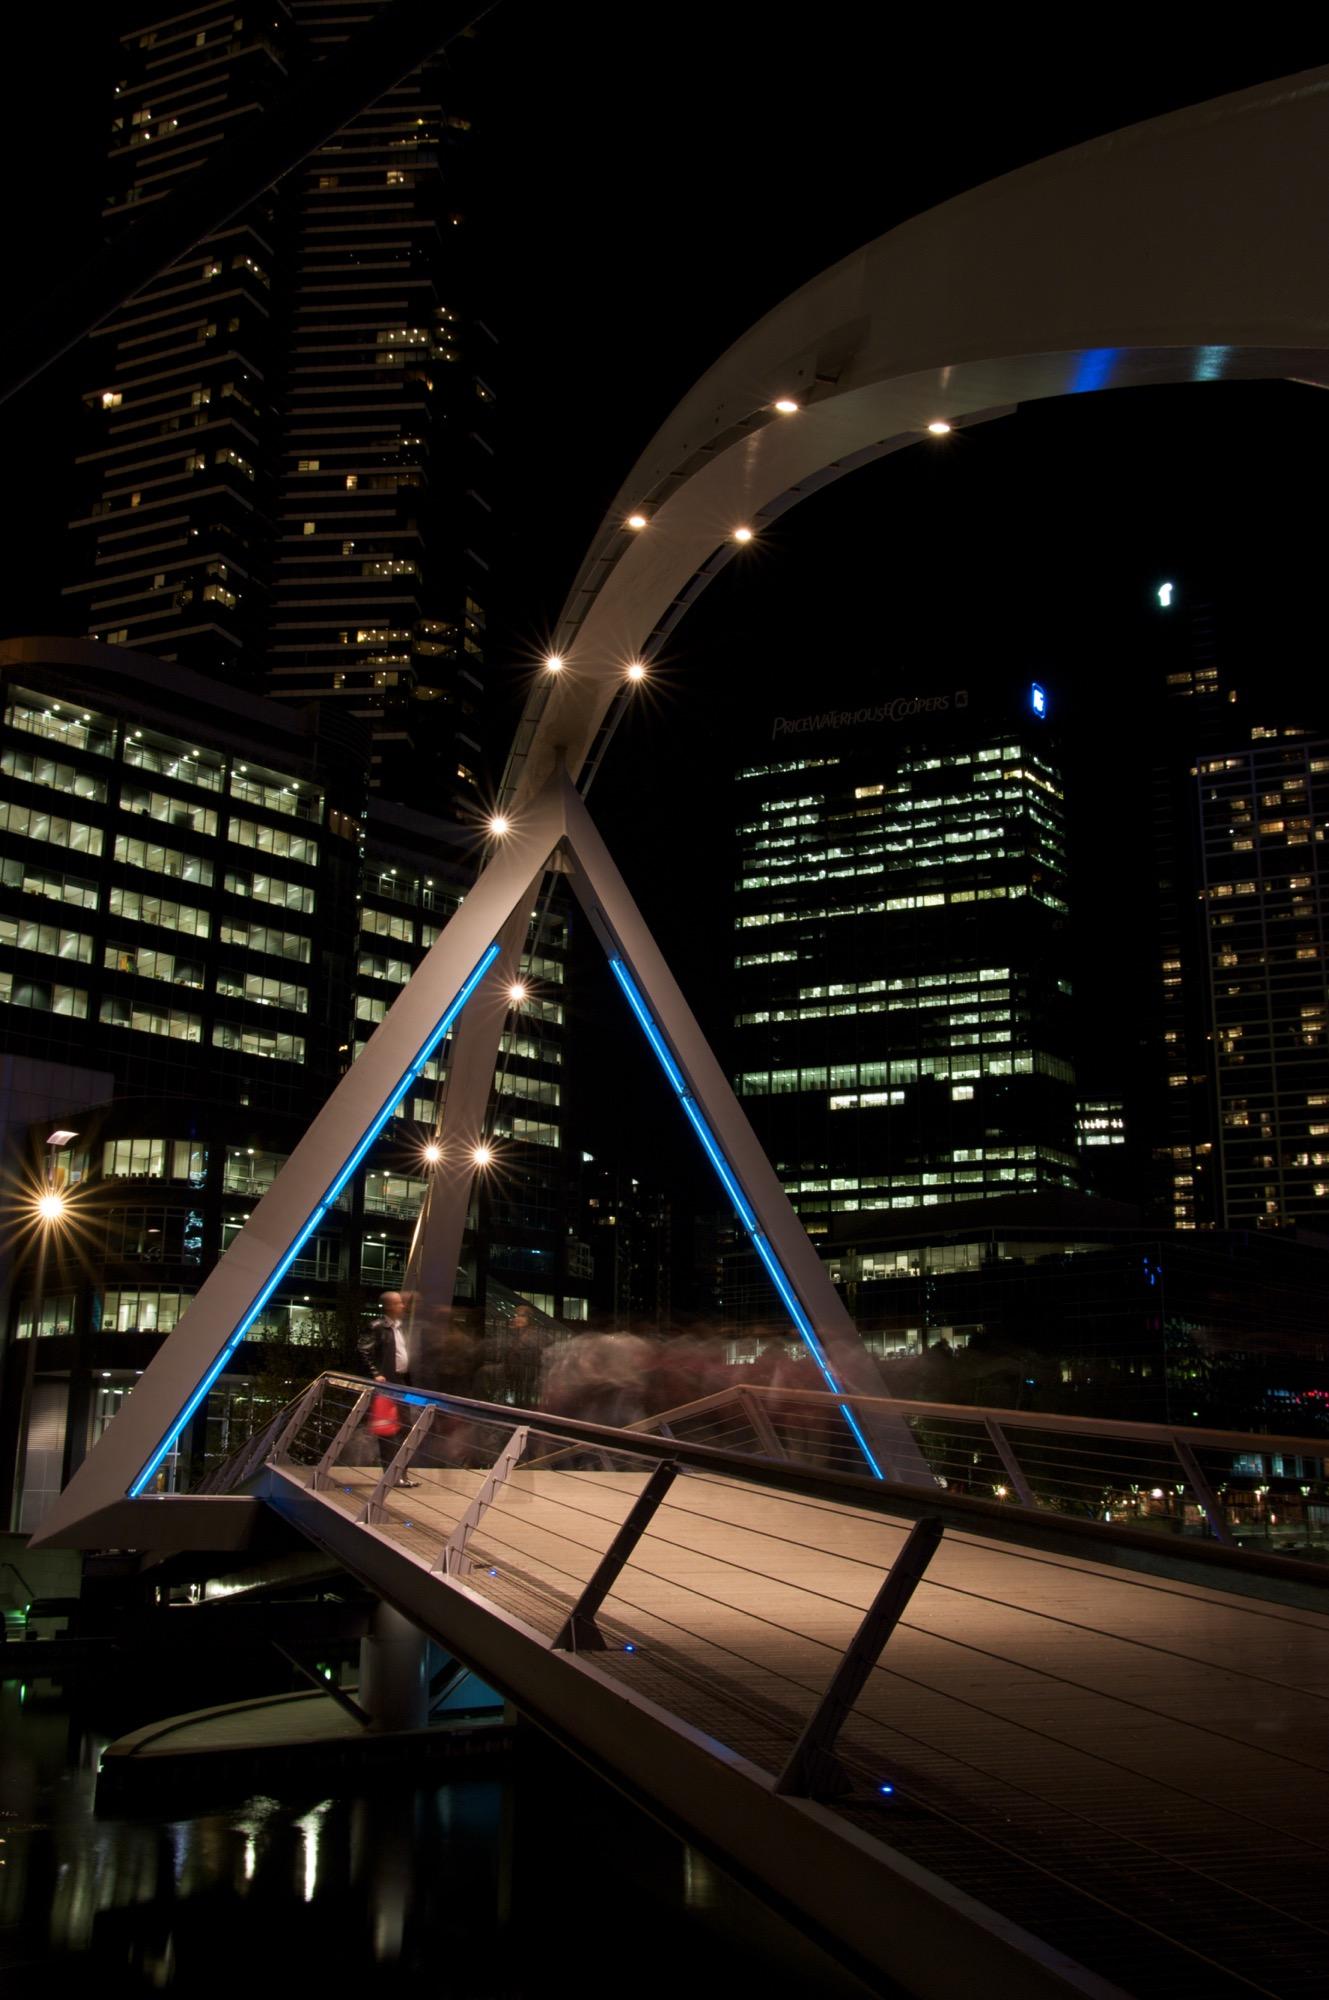 Melbourne stuff - 1 of 223 (186).jpg